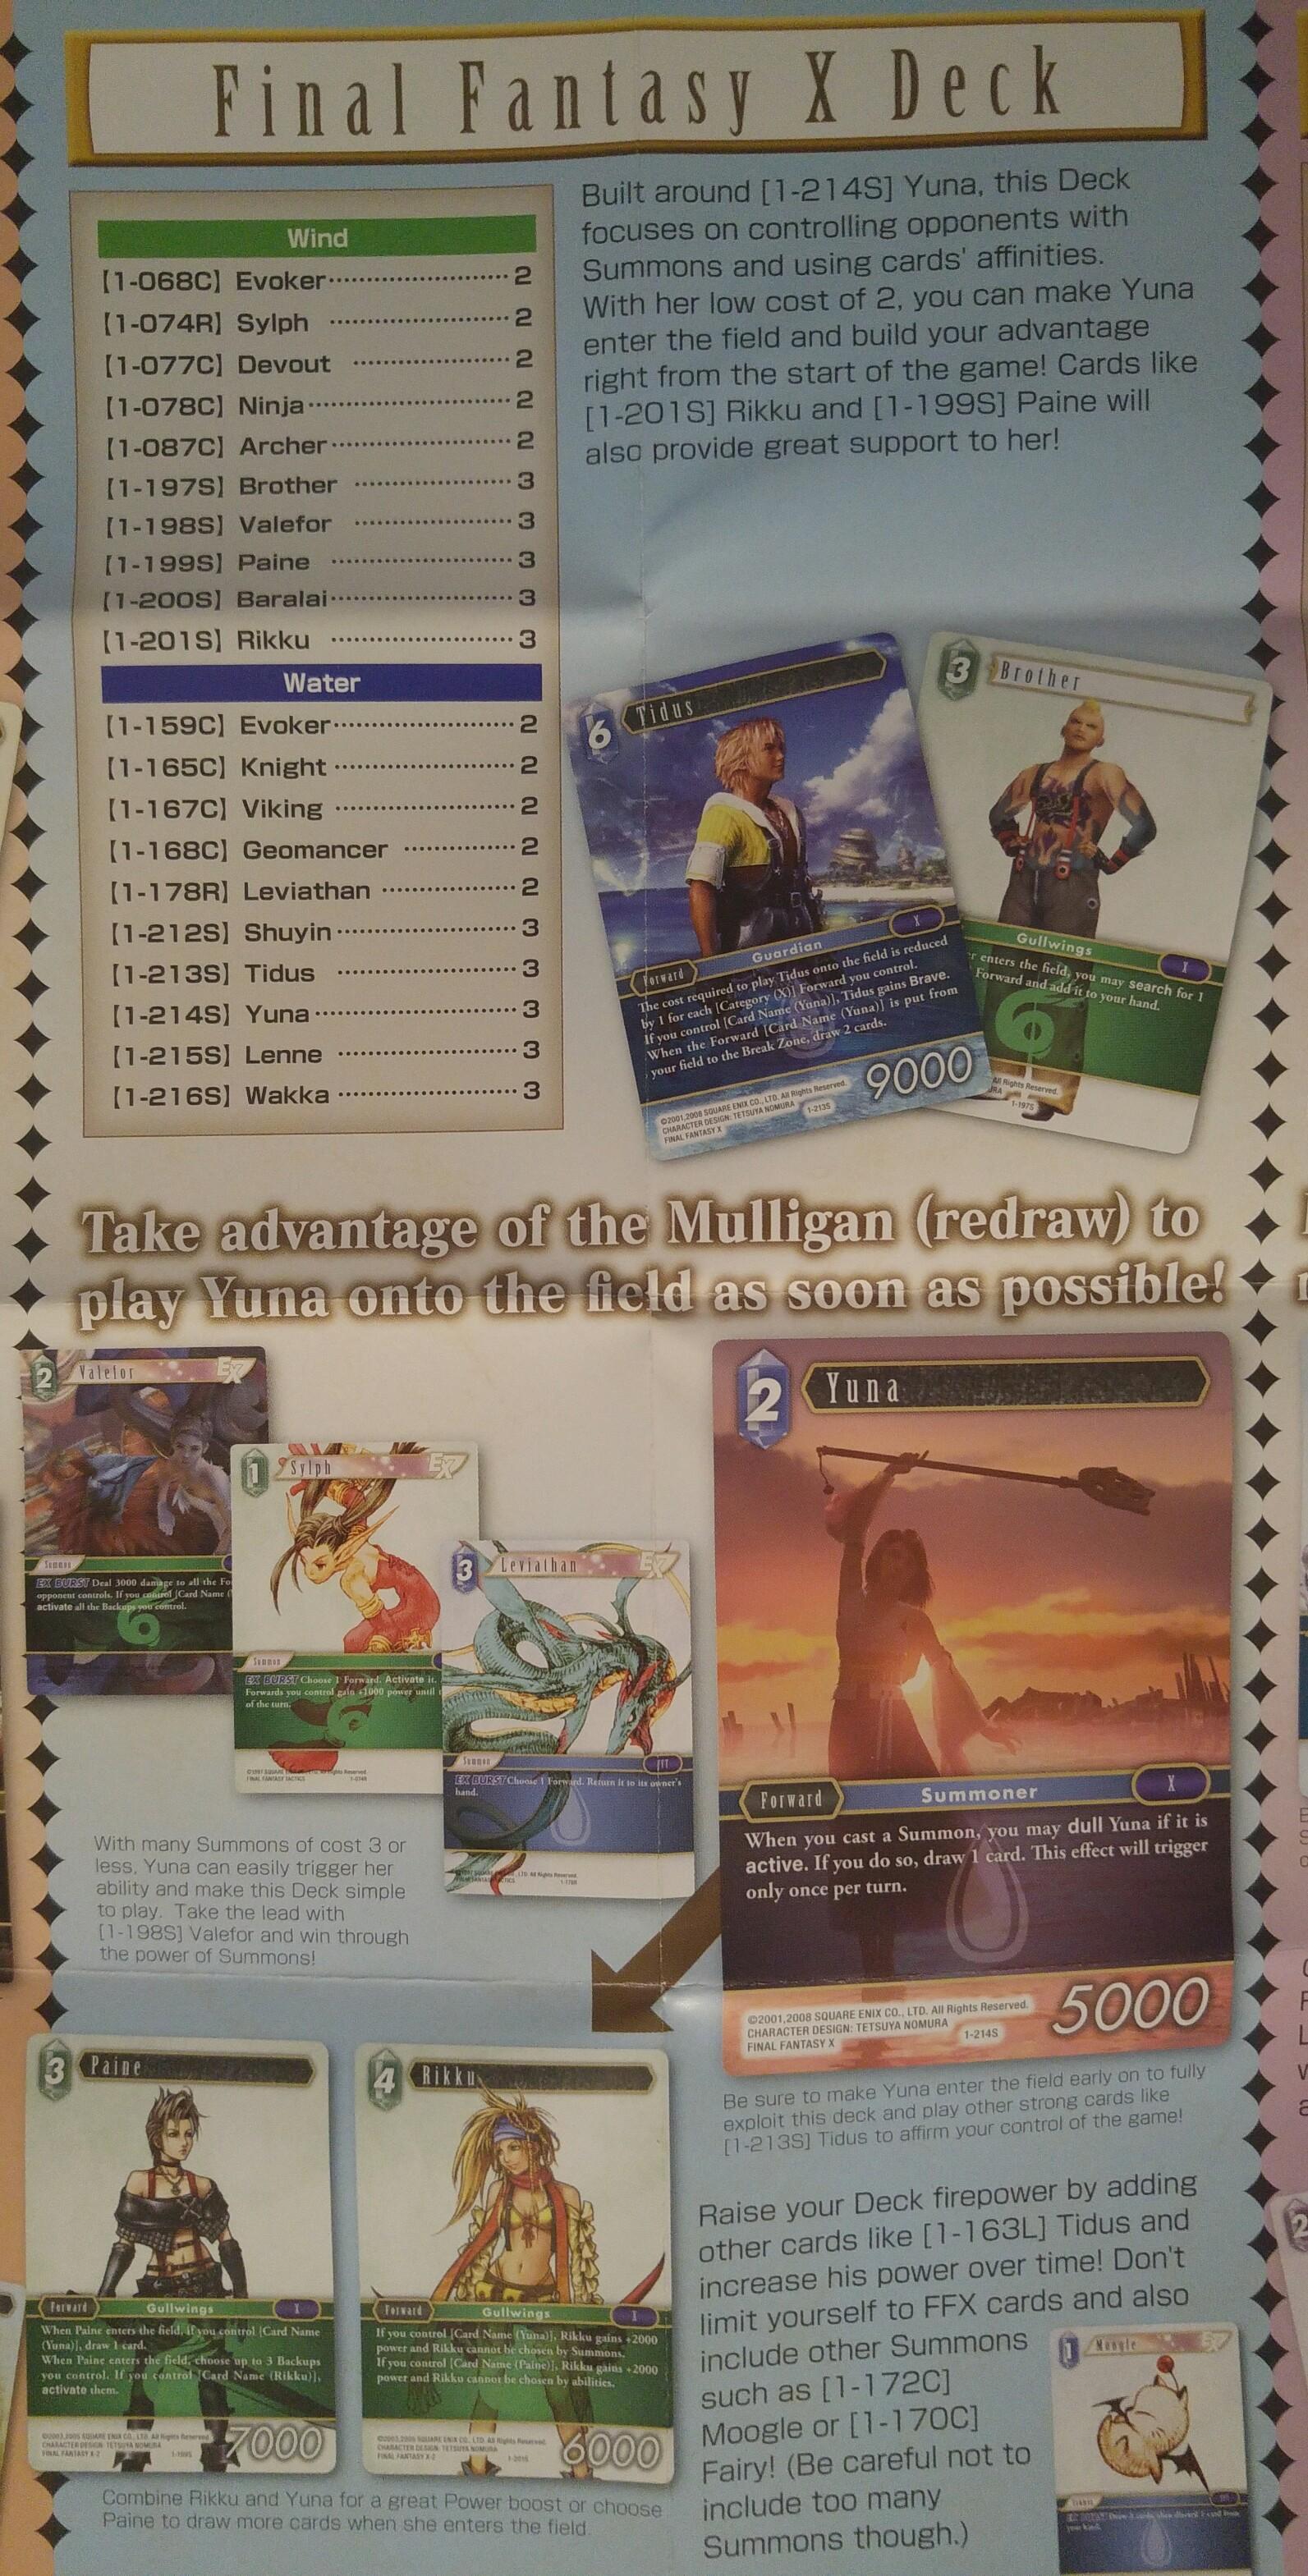 final fantasy 10 guide book